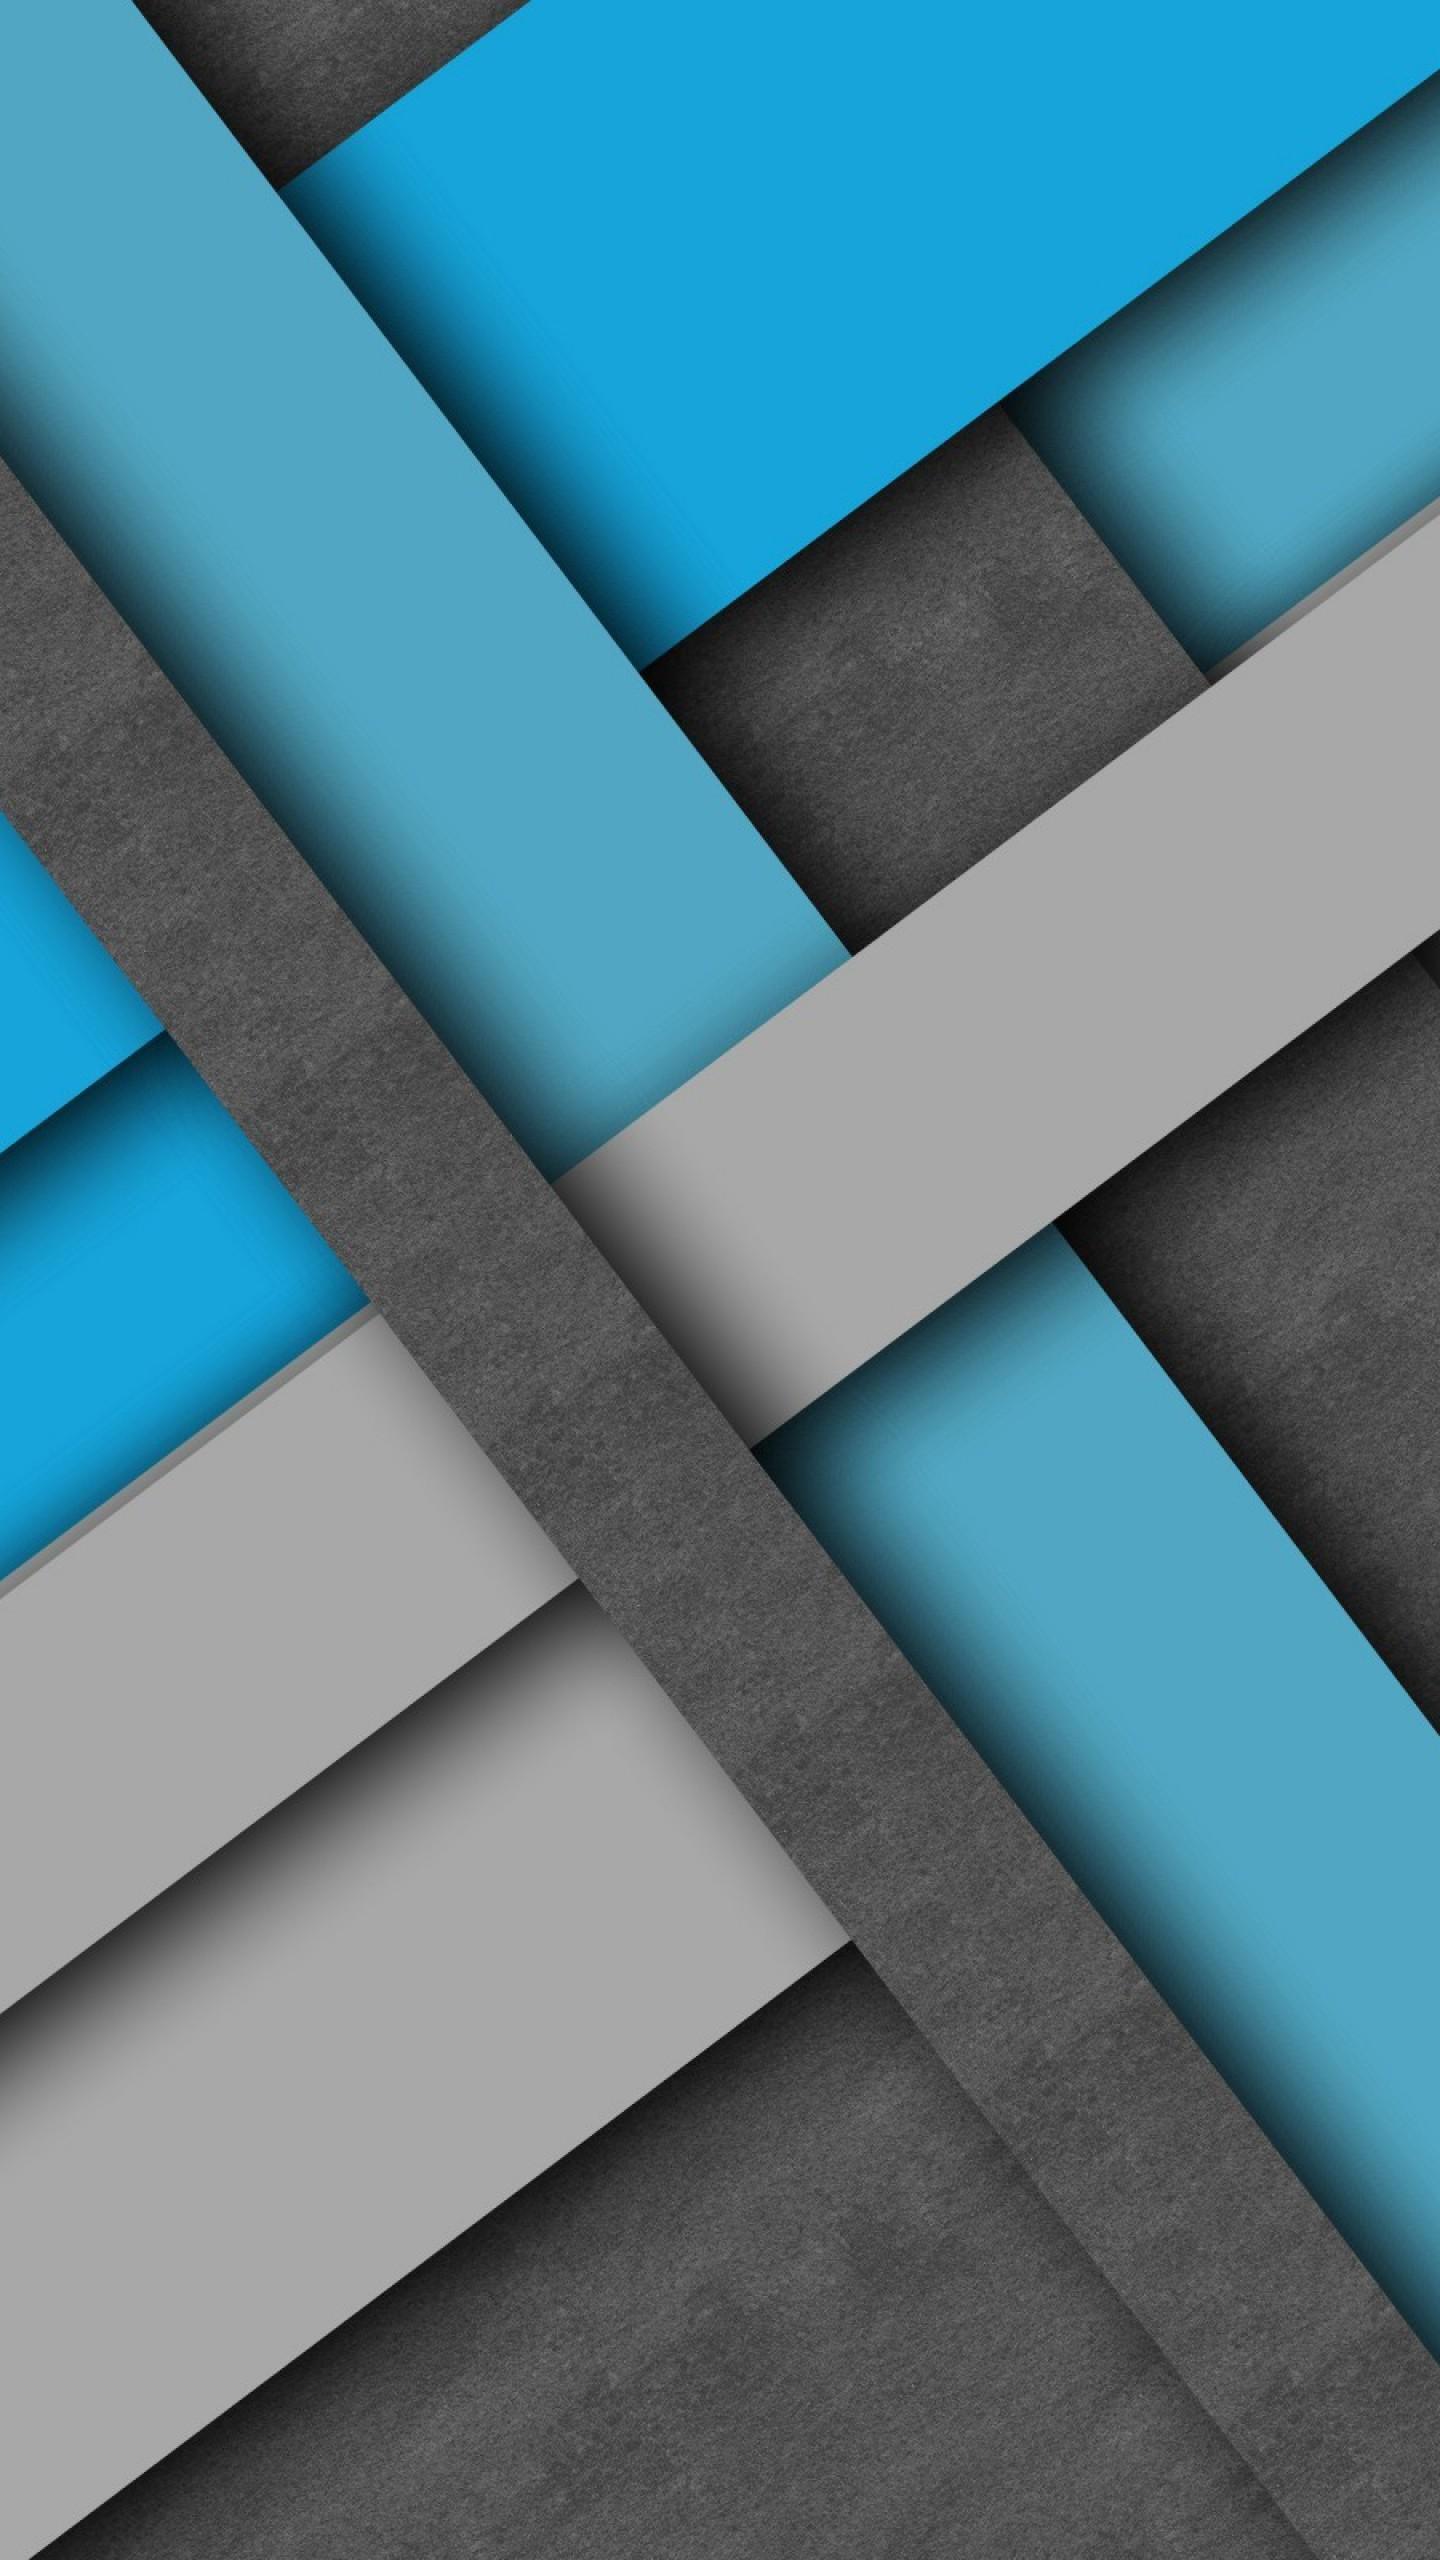 Wallpaper line, shape, texture, blue, gray